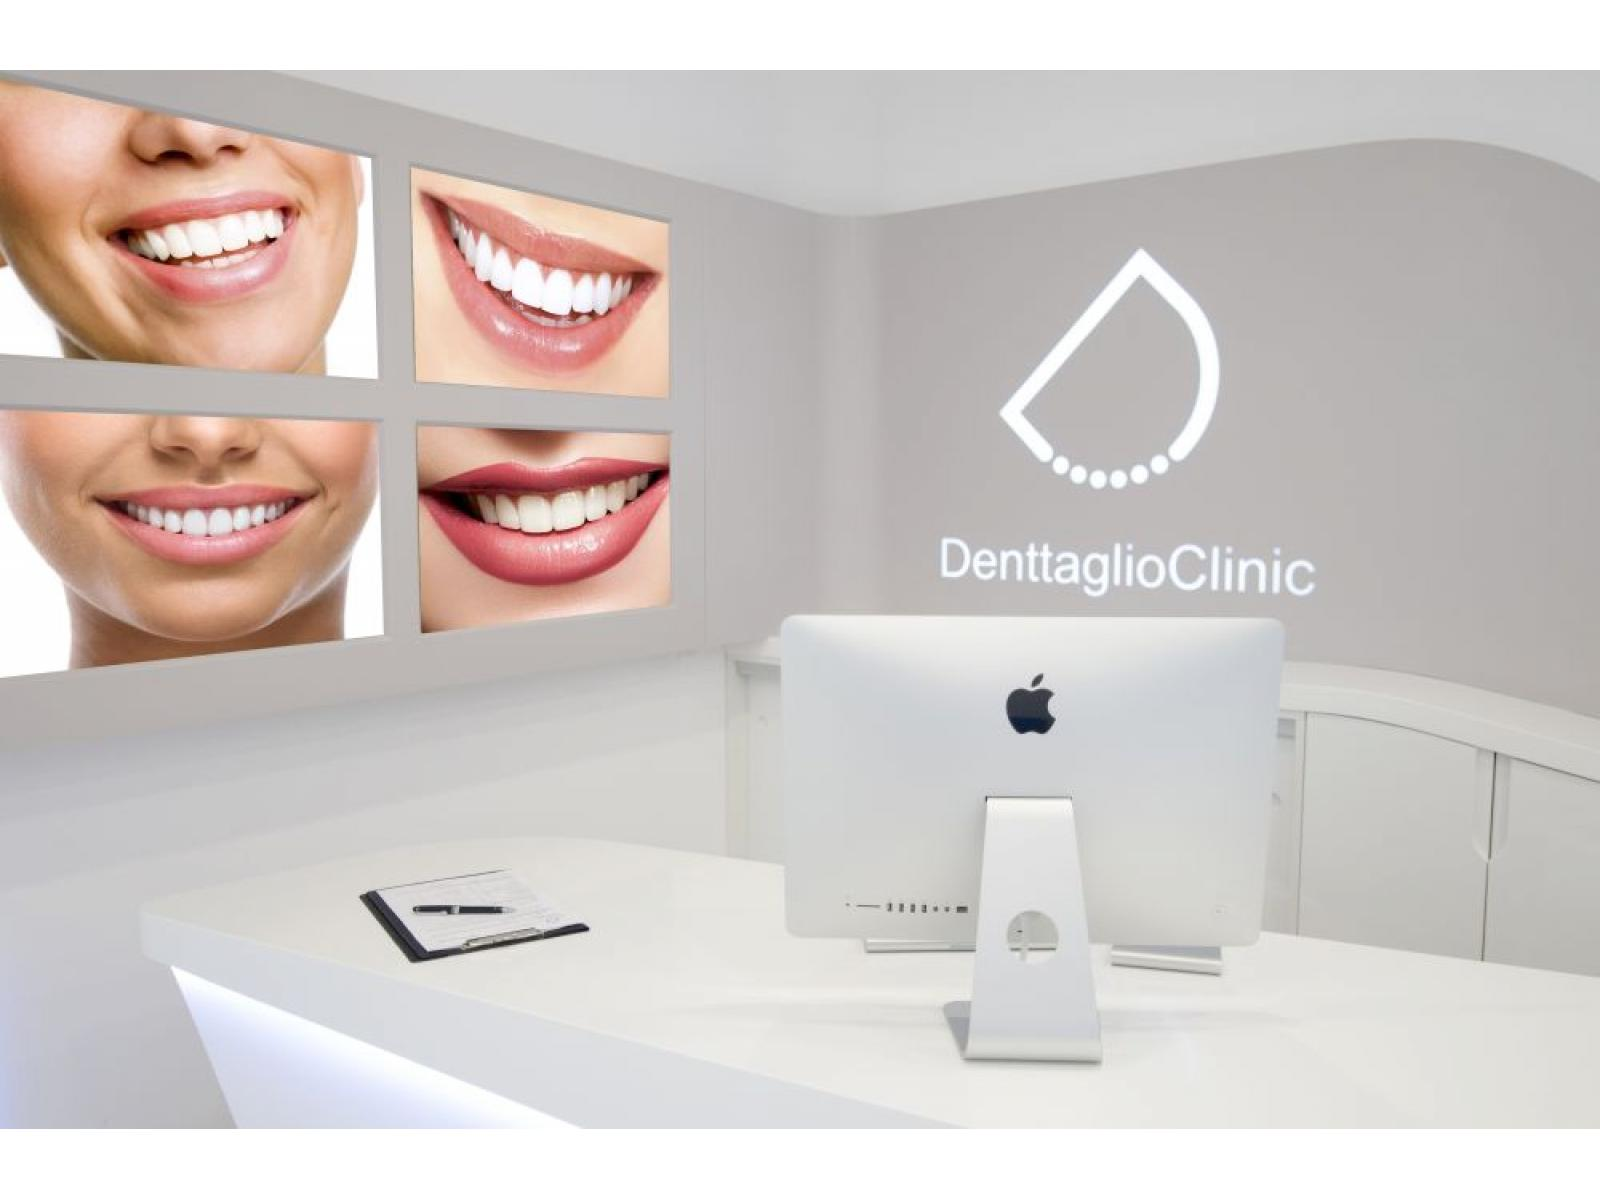 Denttaglio Clinic - Detaliu_birou.jpg